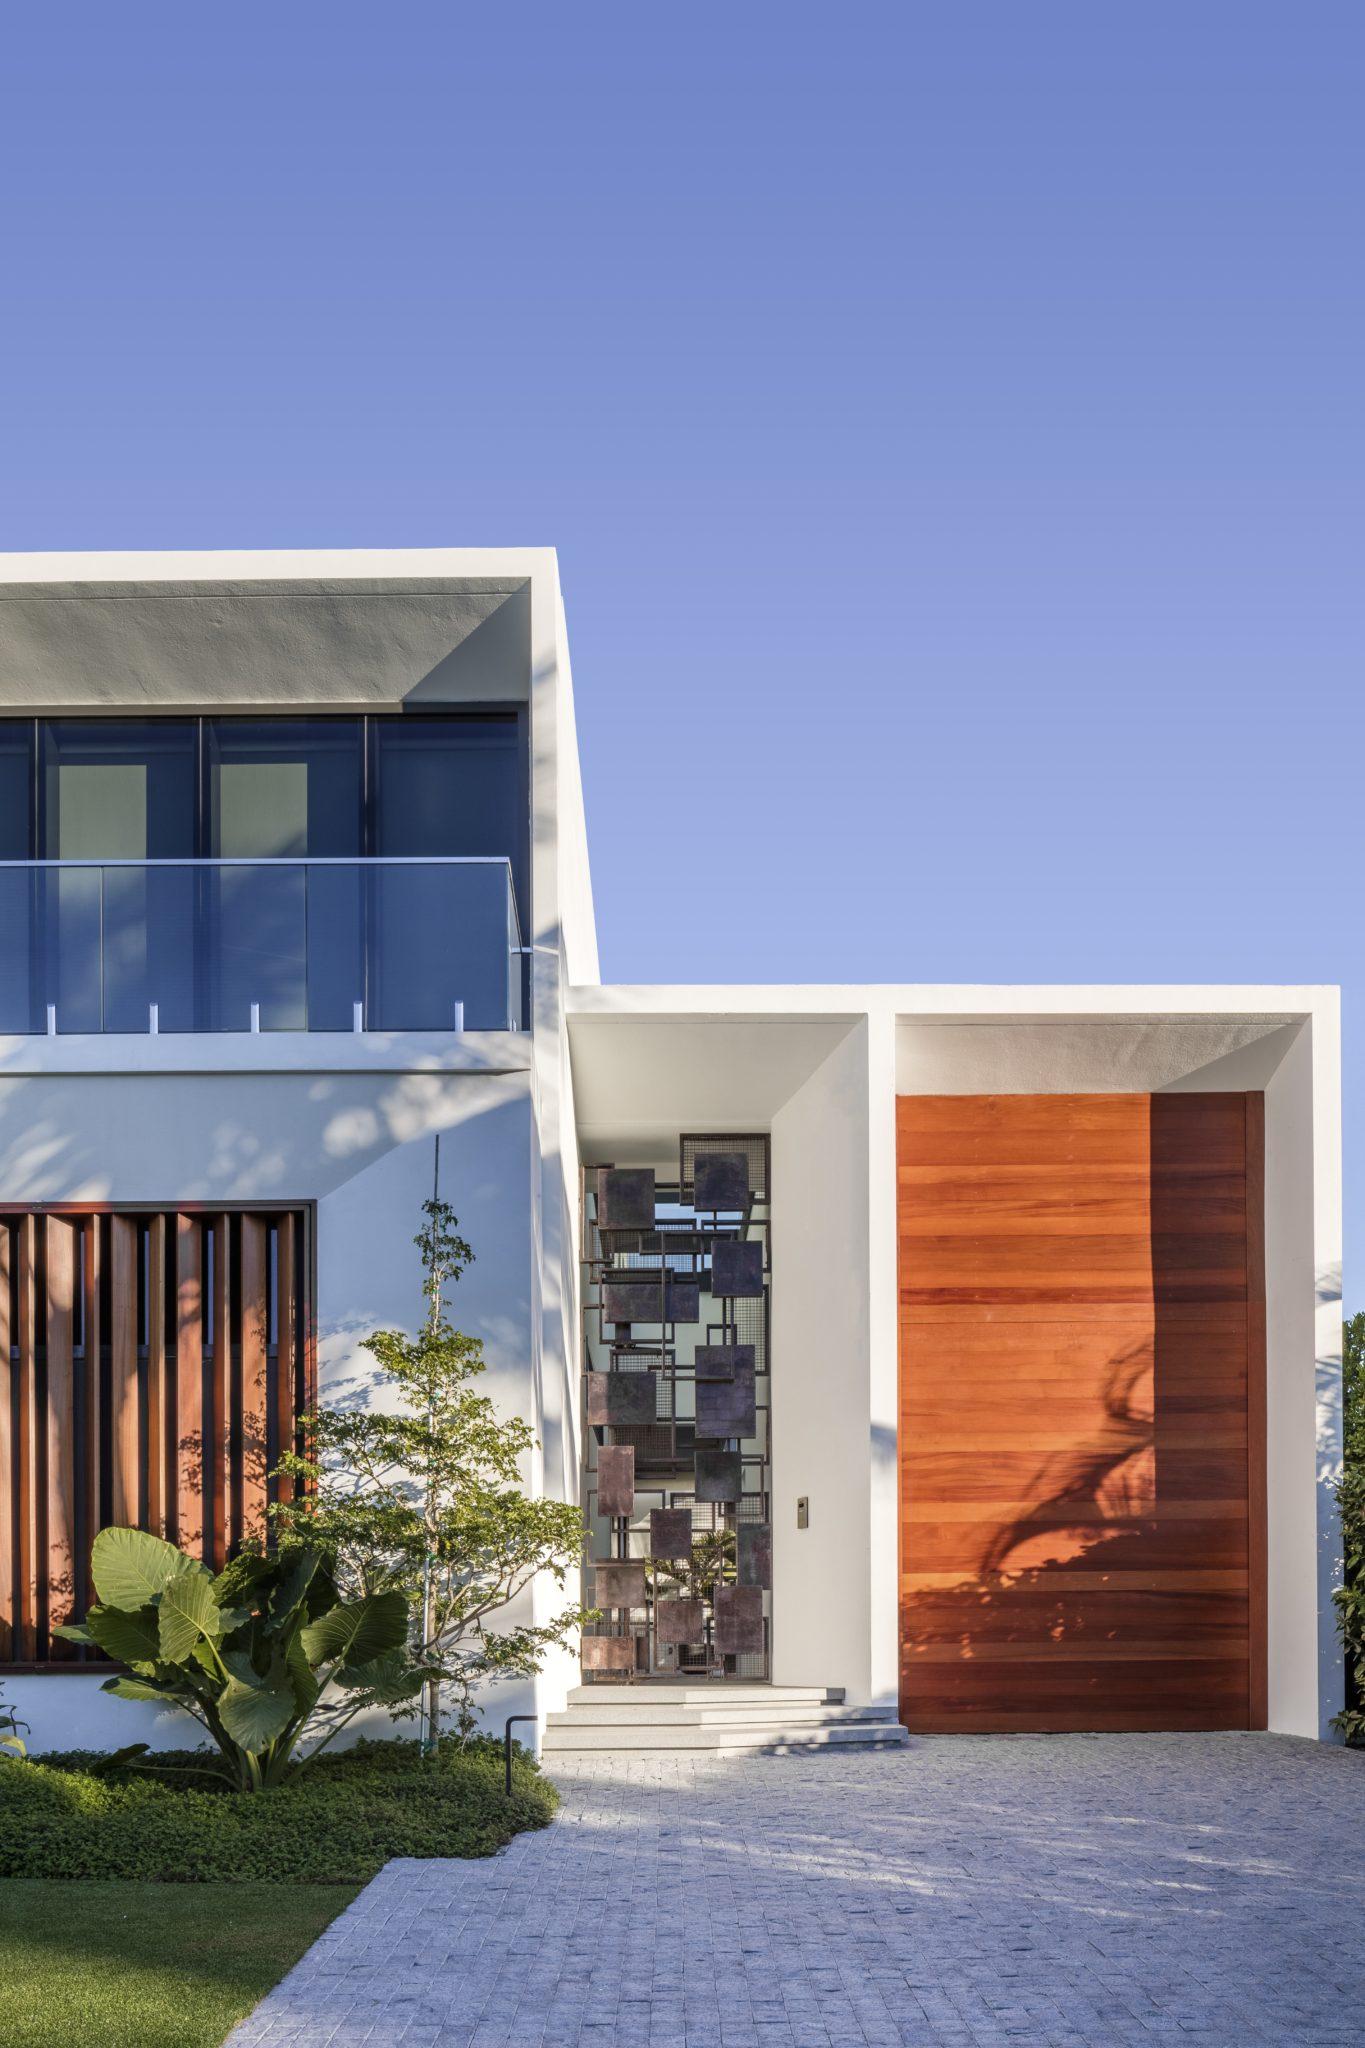 Modern Miami Beach Residence, Architecture, Interiors, Landscape by Brown Davis by Brown Davis Architecture & Interiors